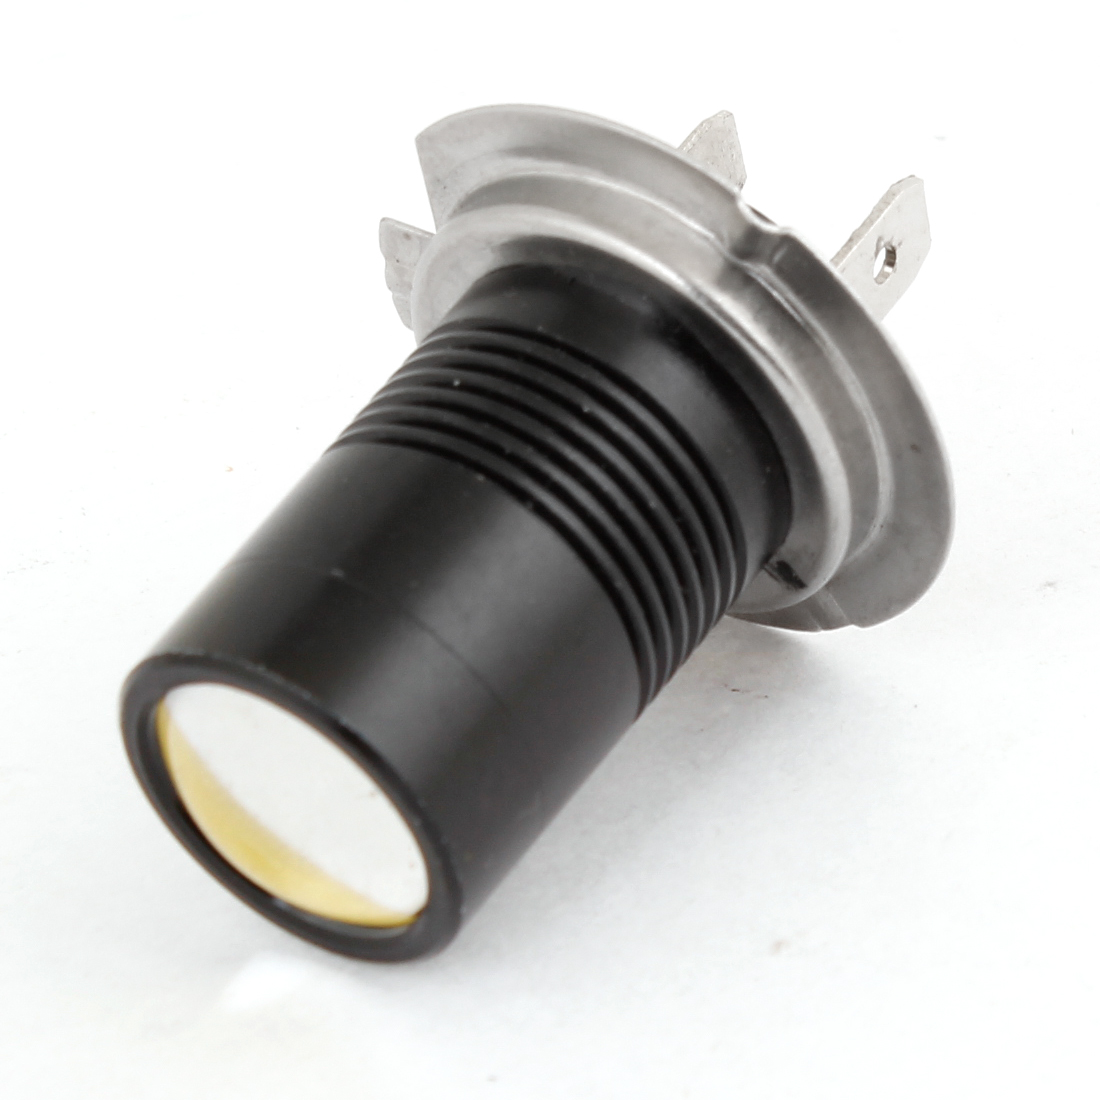 Auto Truck LED SMD H7 Lens DRL Foglamp Driving Light Head Lamp White 12V 20W